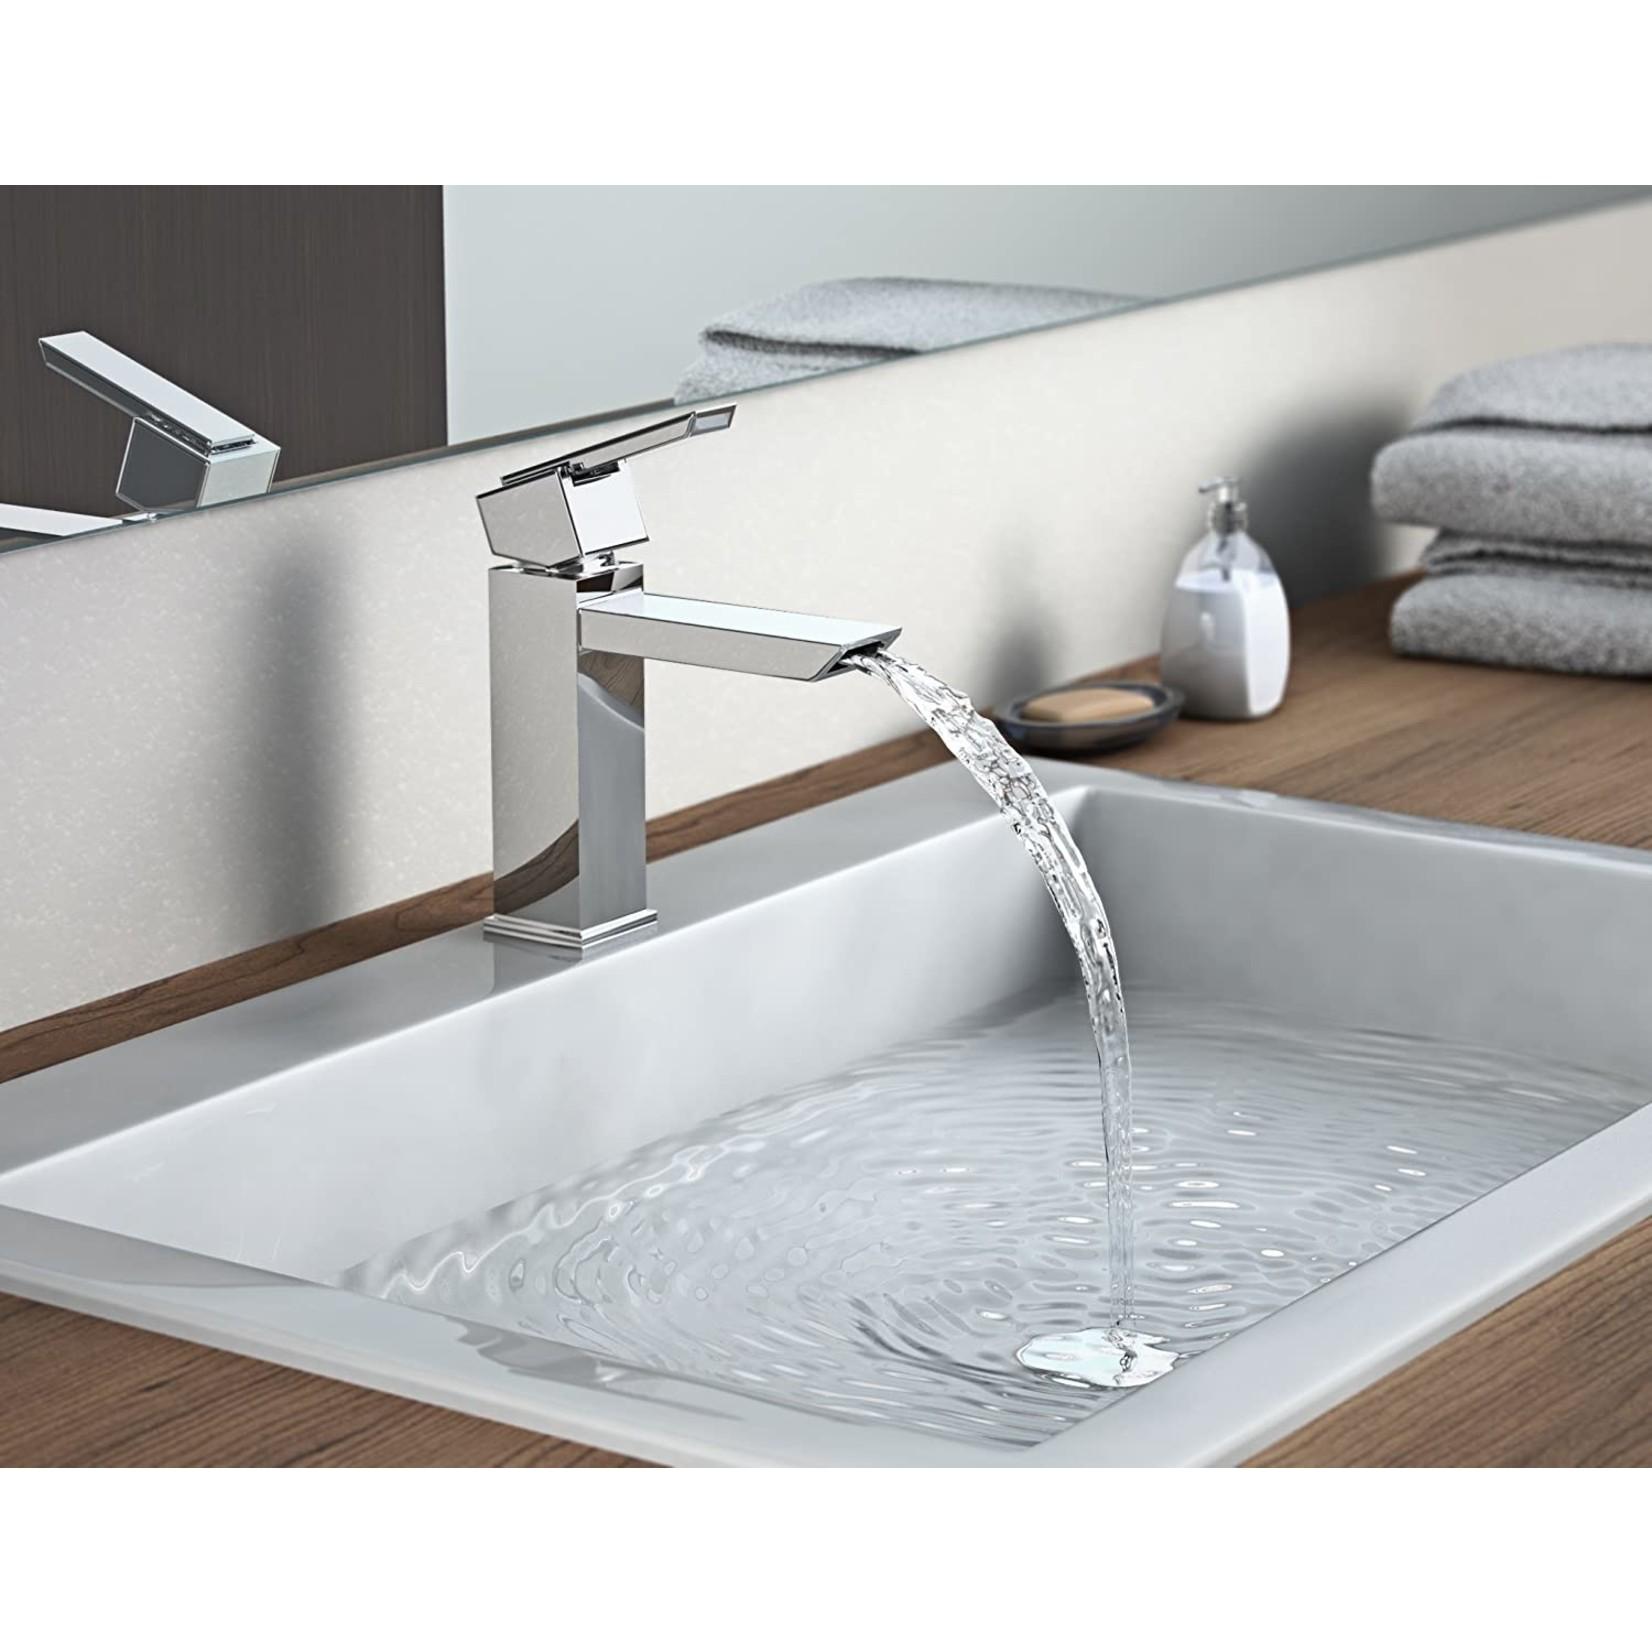 Artika Oblique Chrome faucet + Pop Up plate included